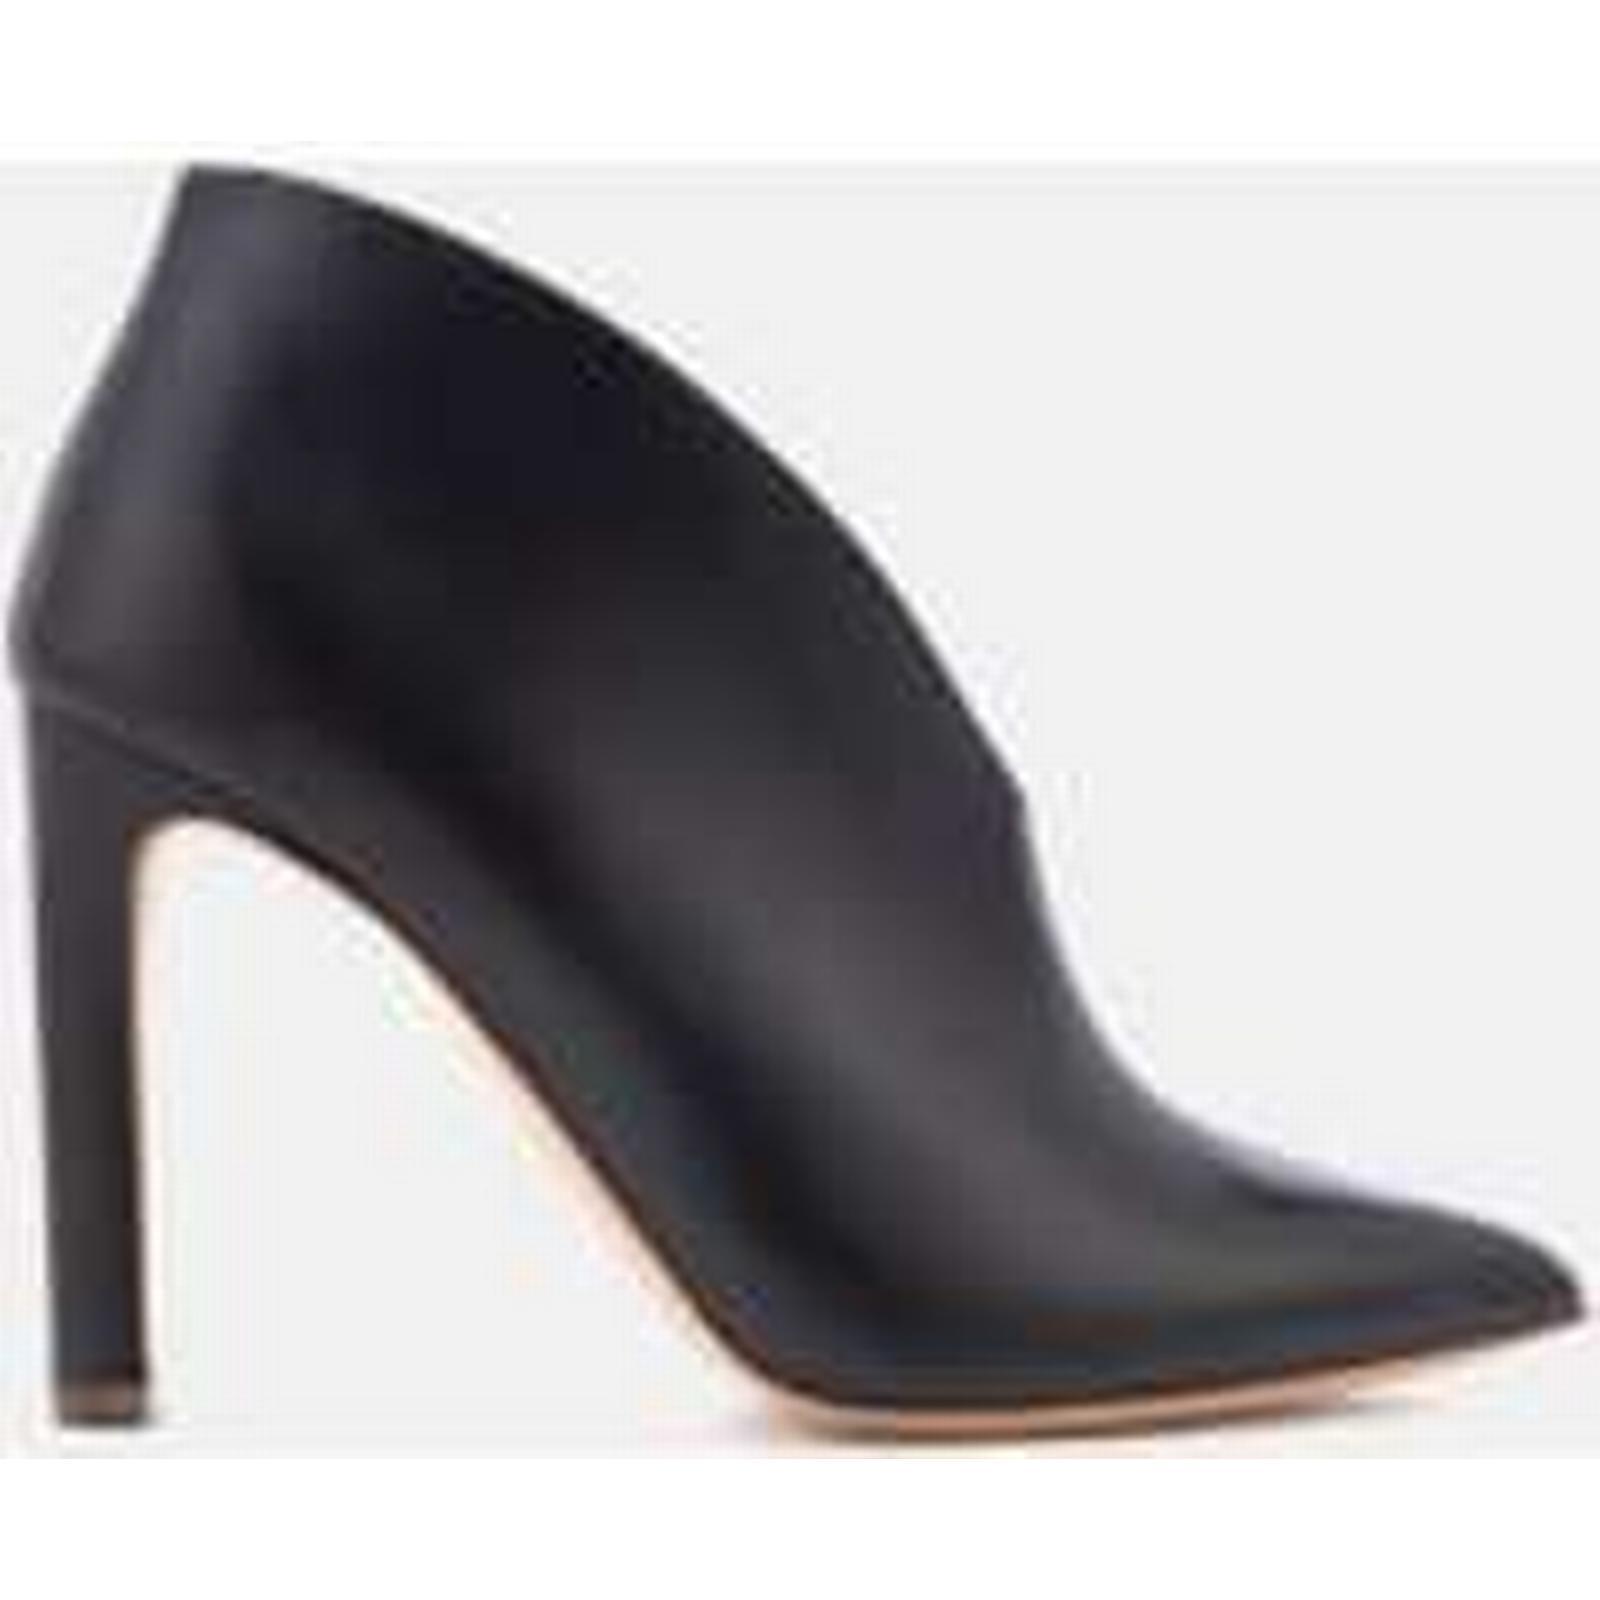 Rupert Sanderson Women's Boots Lolita Leather Heeled Ankle Boots Women's - Black - UK 4 - Black 3cb499